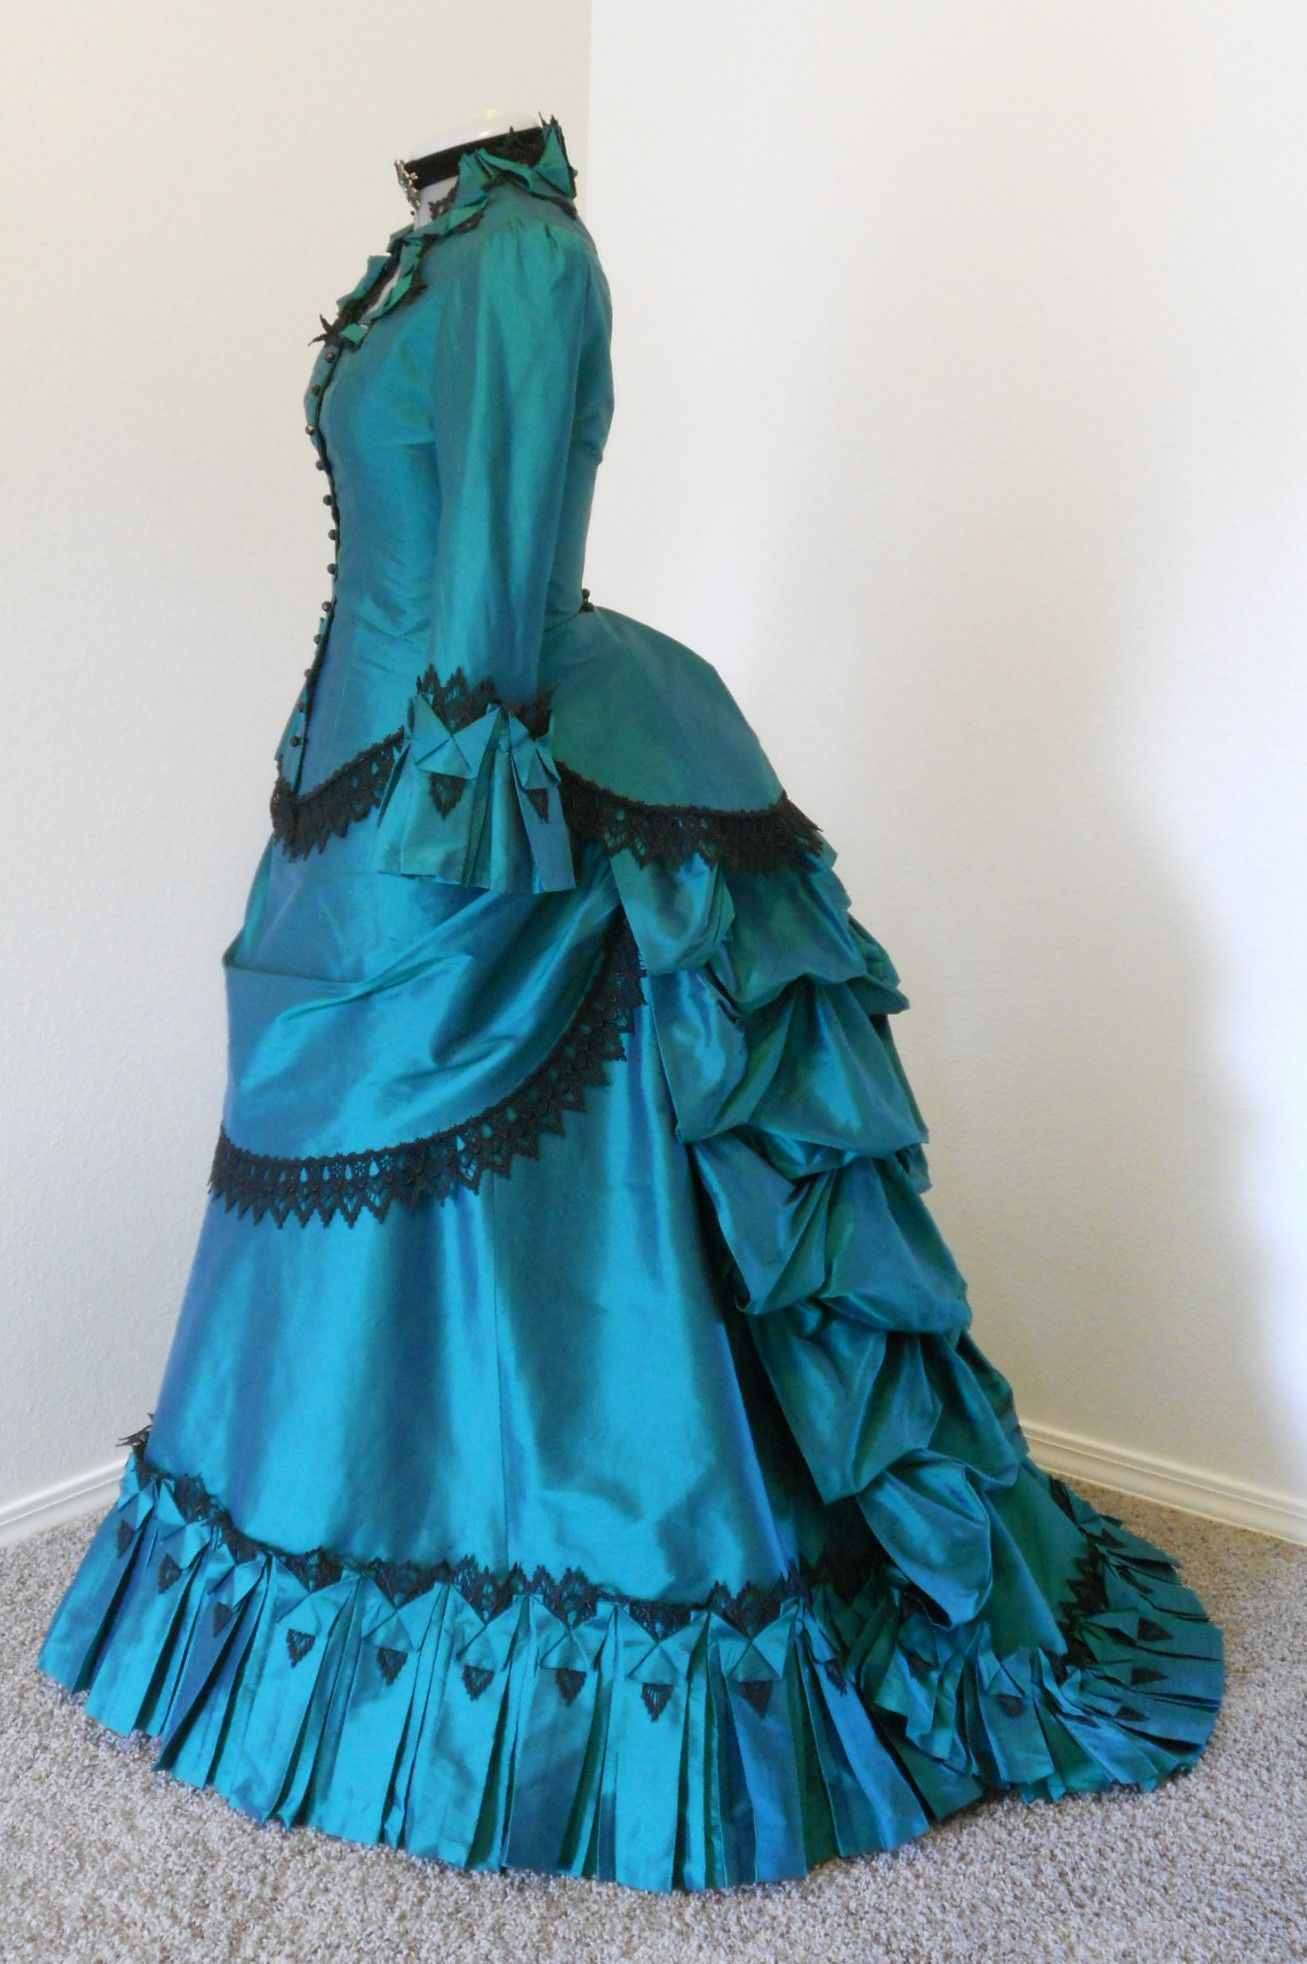 Medium Of Victorian Style Dresses